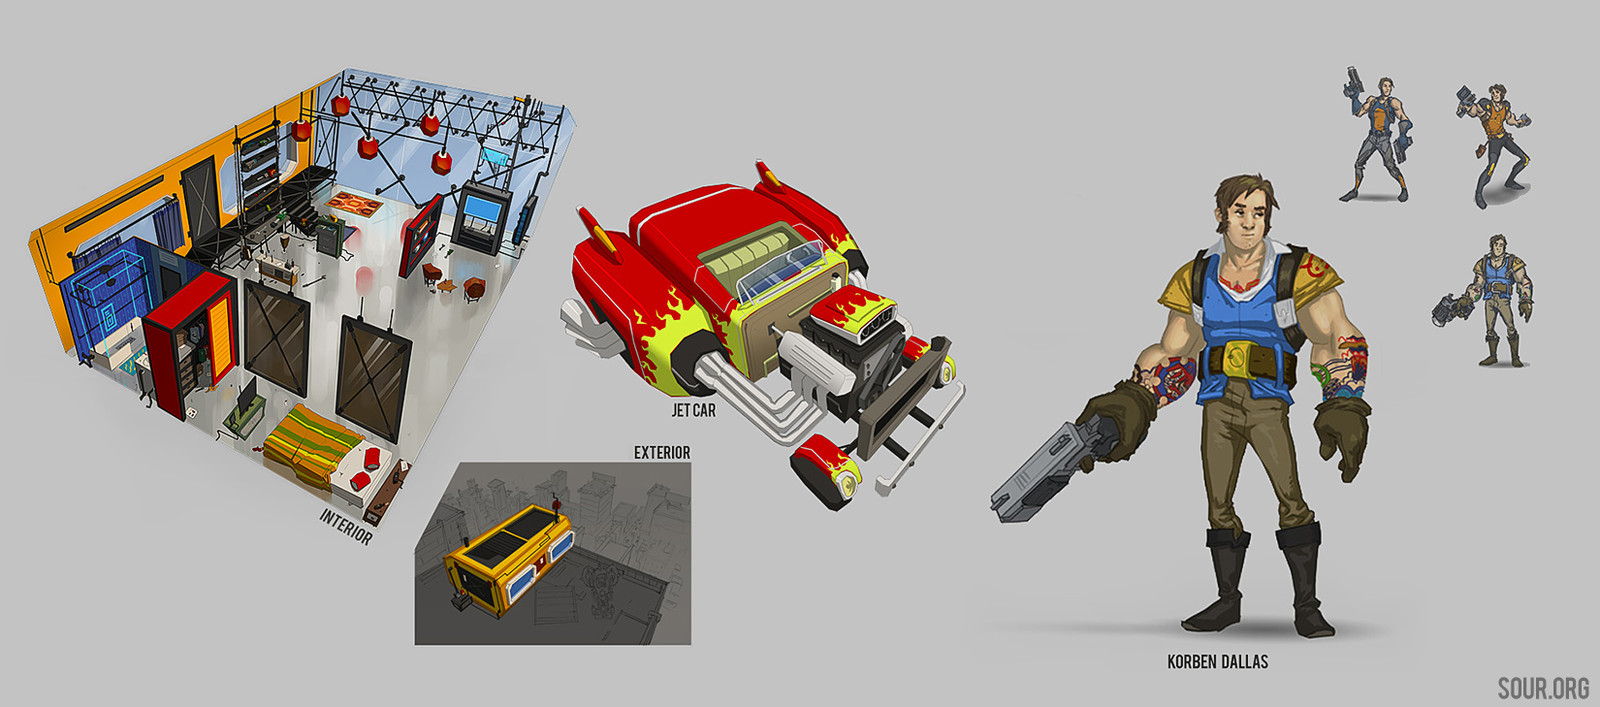 Korben Dallas + Rocket Car + Apartment, redesigned for cartoony comic book.